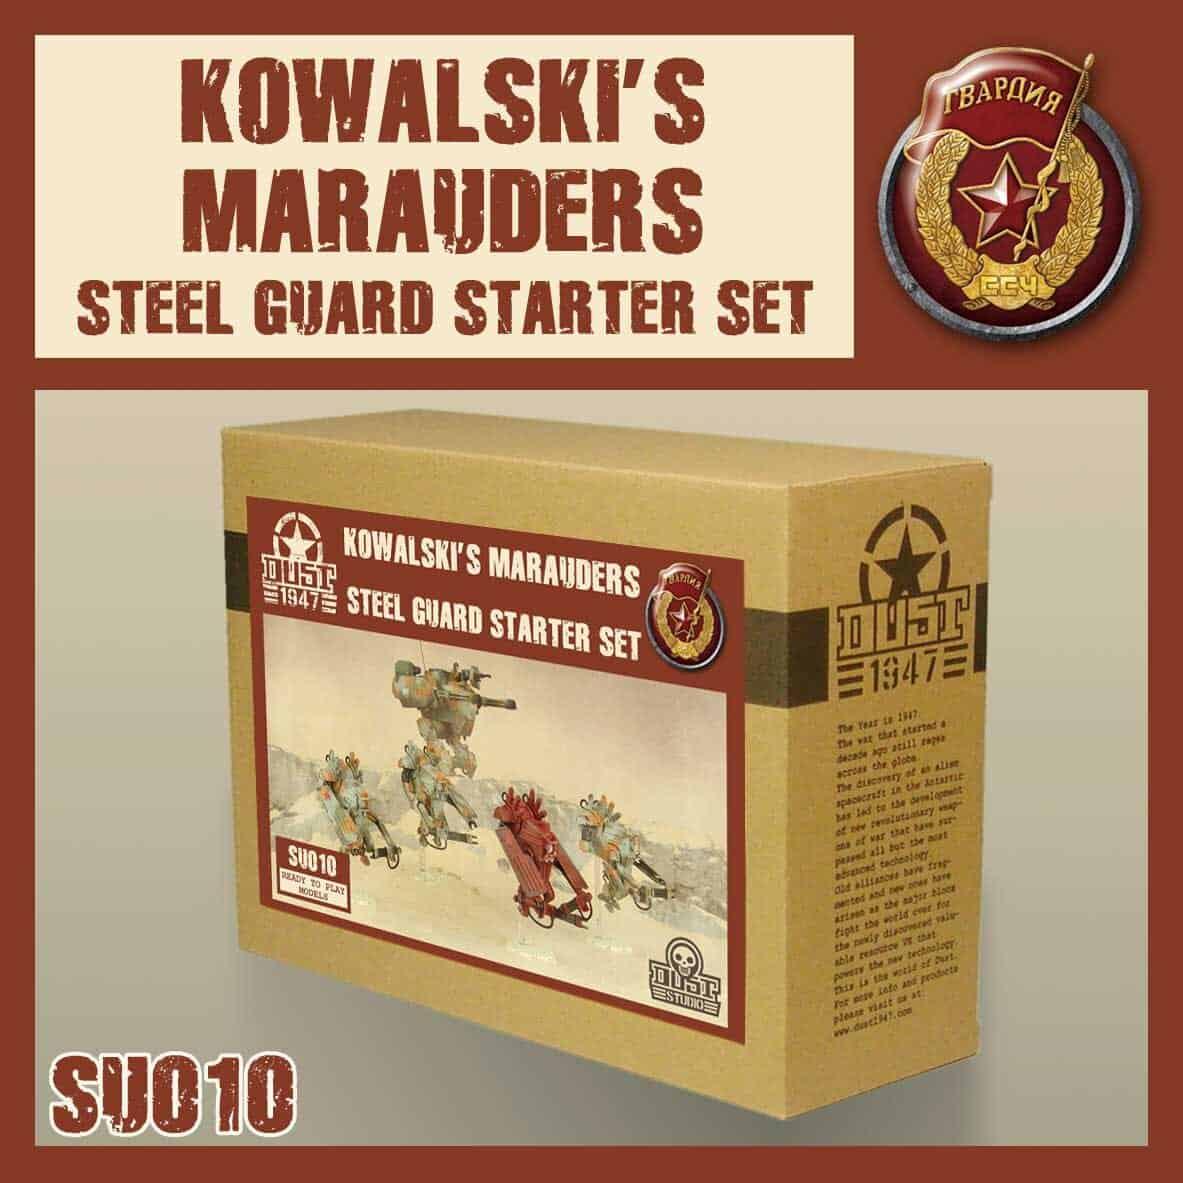 Kowalski's Marauders